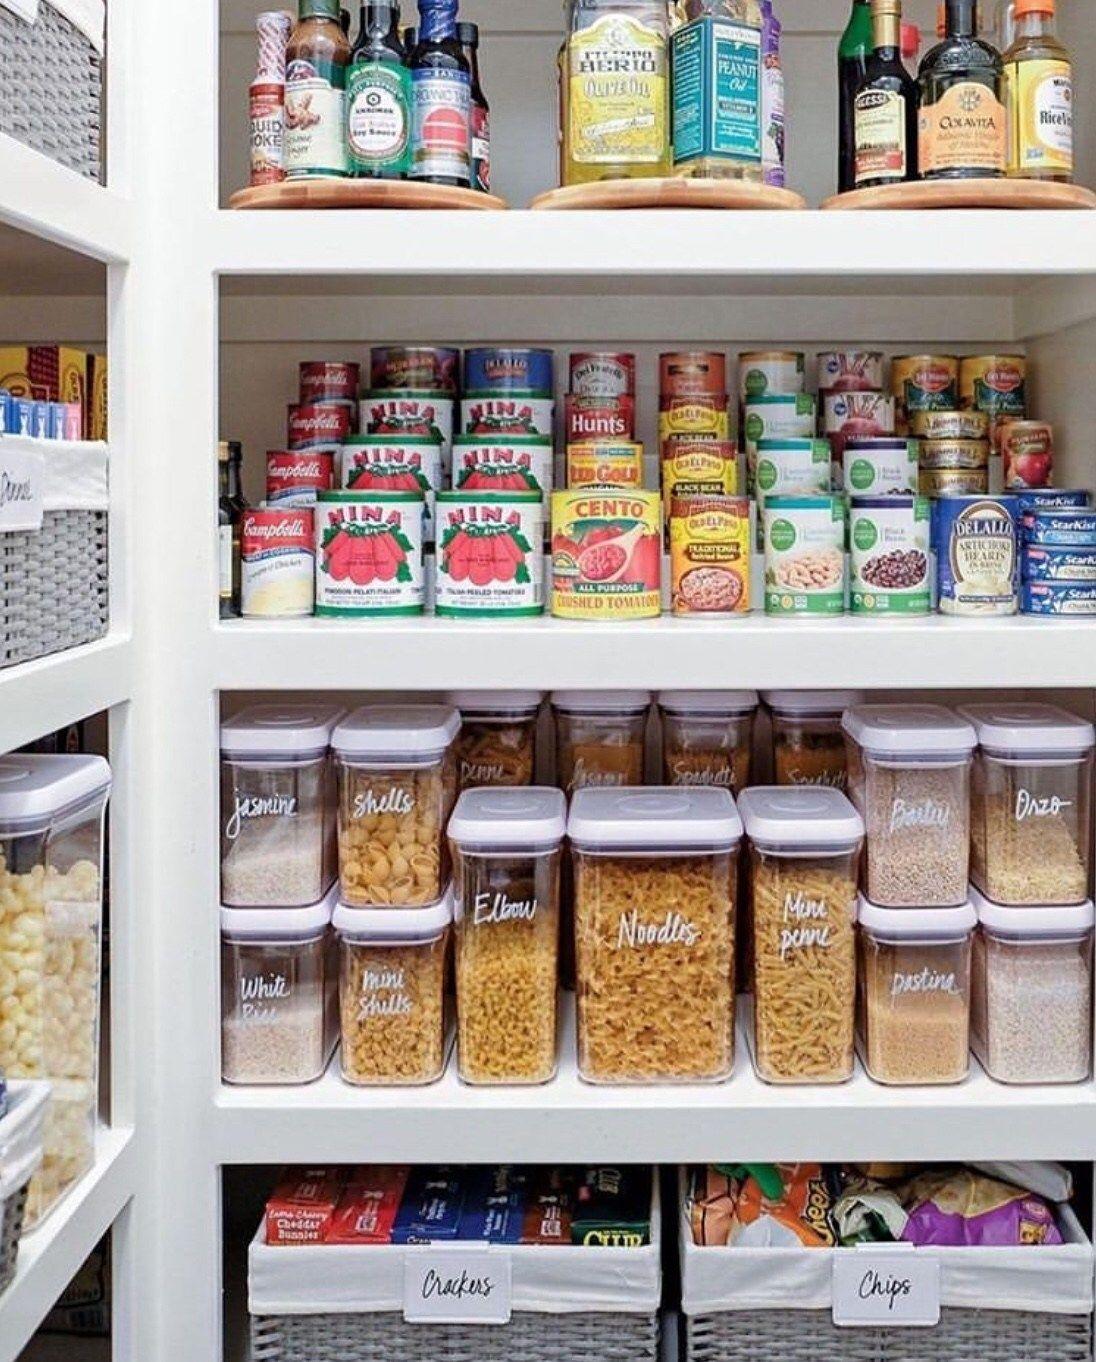 50 Clever Pantry Organization Ideas The Wonder Cottage Organizing Your Home Diy Kitchen Storage Kitchen Storage Organization